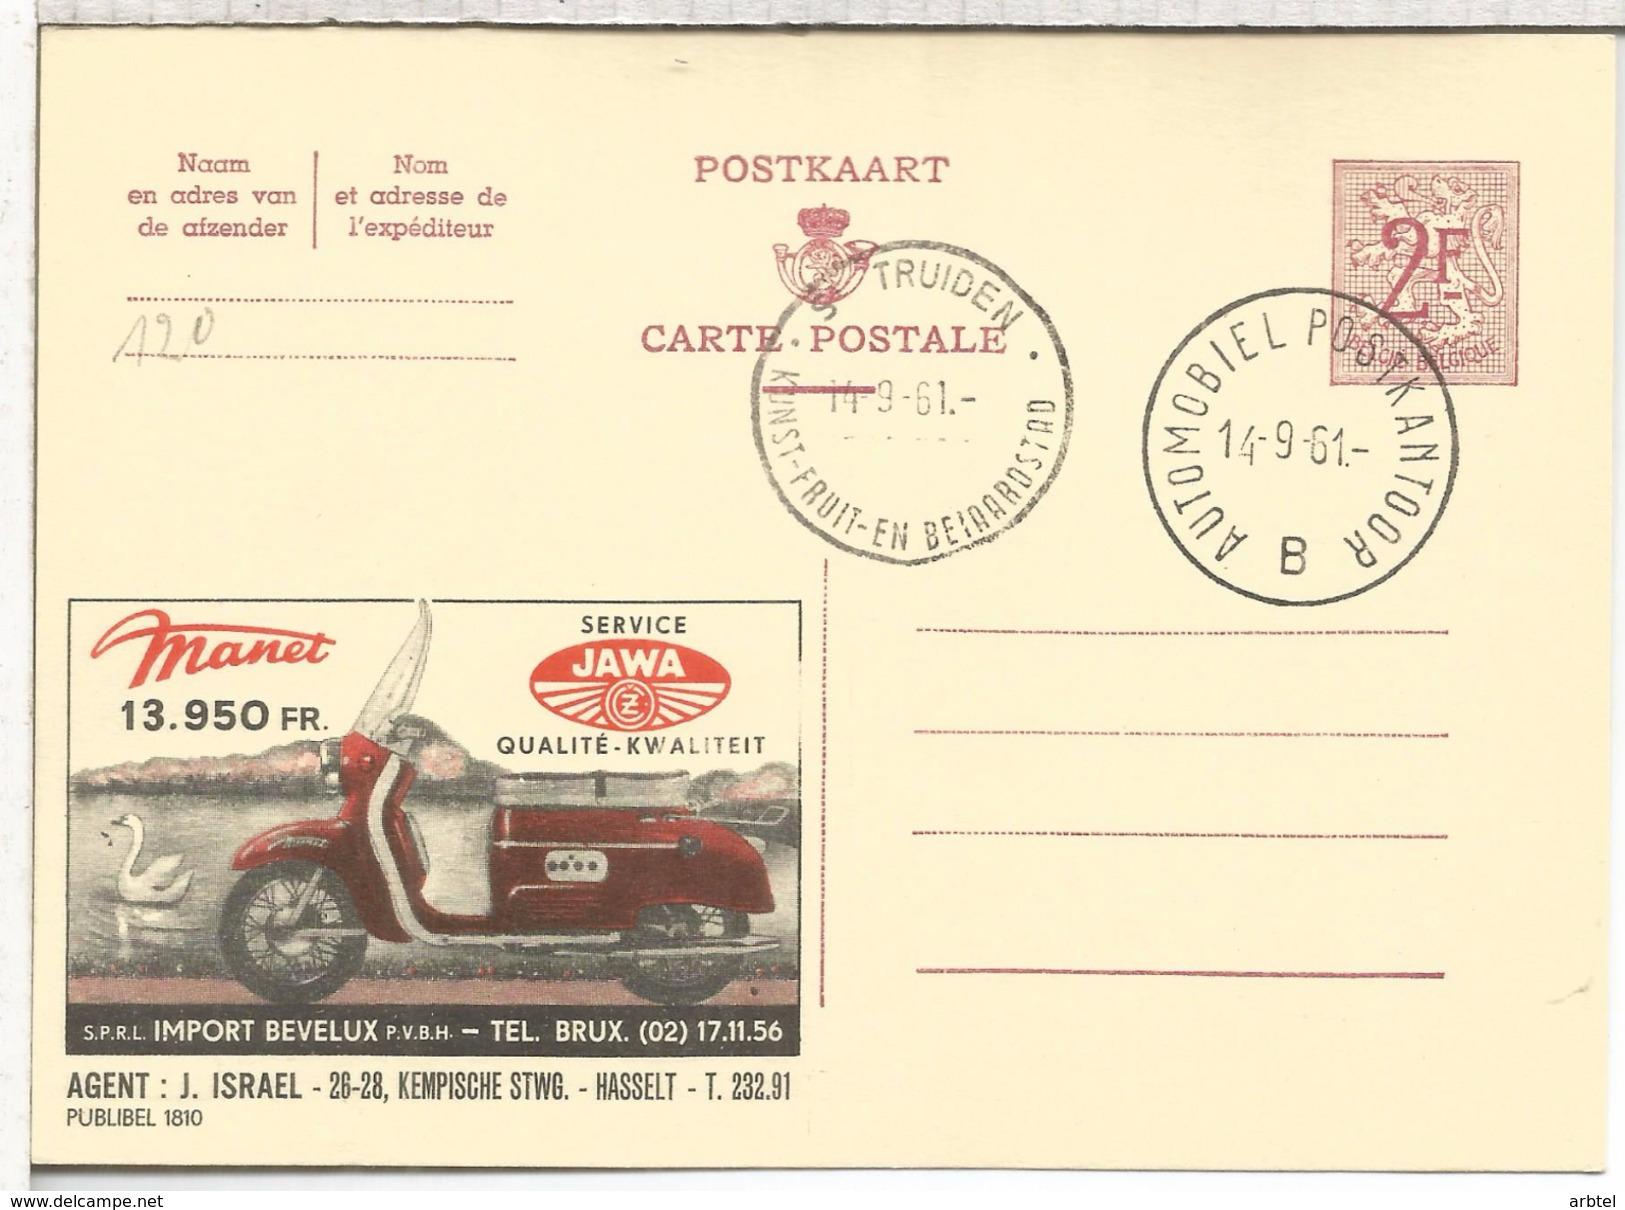 BELGICA ENTERO POSTAL PUBLIBEL MOTOCICLETA MANET JAWA MAT S TRUIDEN KUNST FRUIT 1961 - Motorfietsen